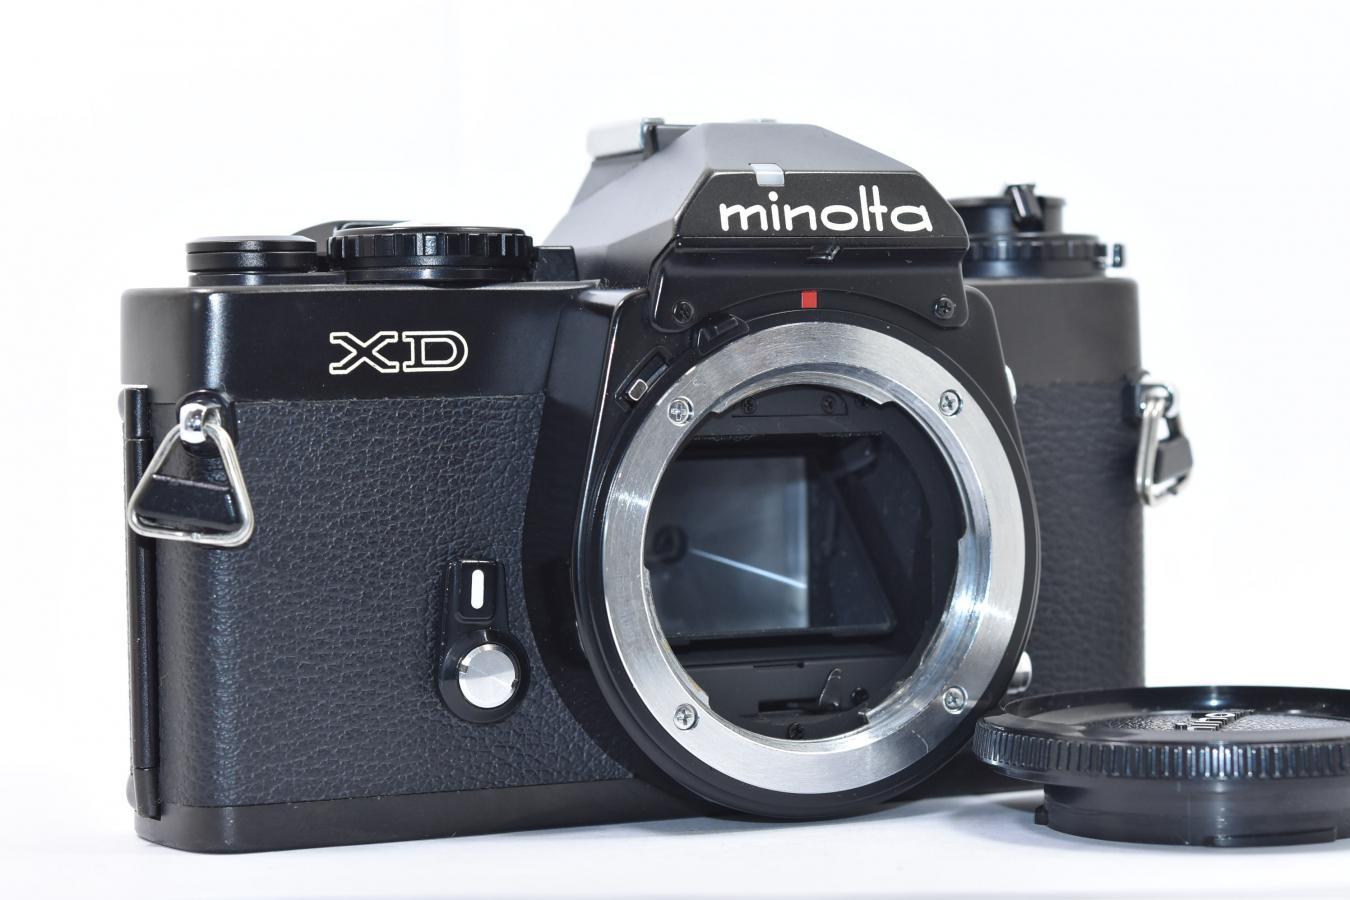 minolta XD ブラック 【モルト交換済】